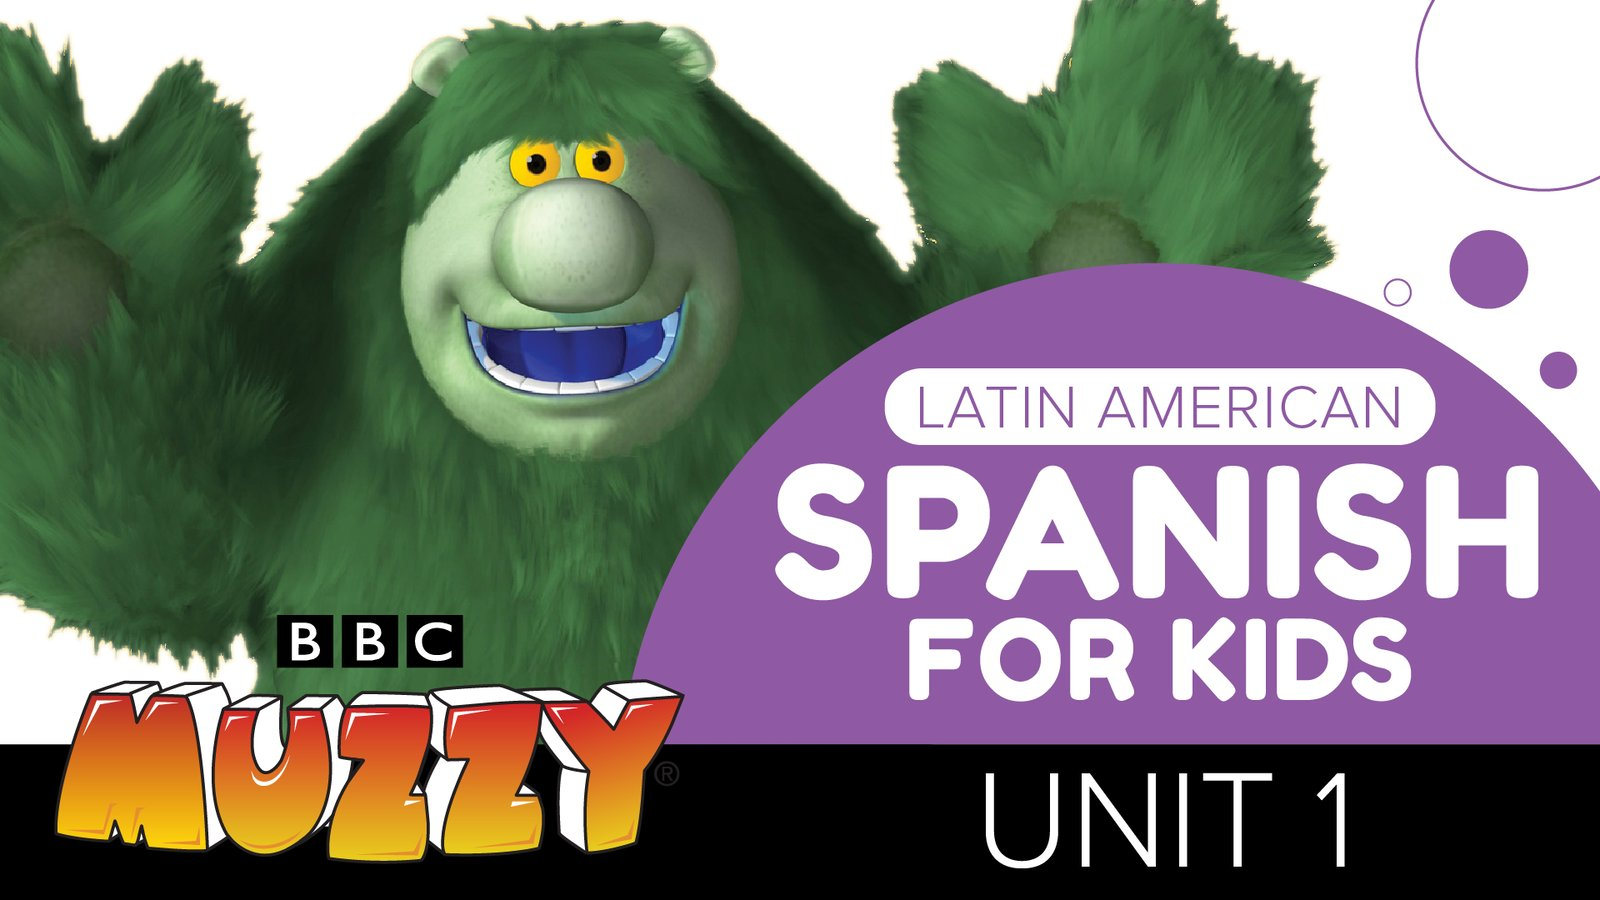 Spanish (Latin American) for Kids - Unit 1